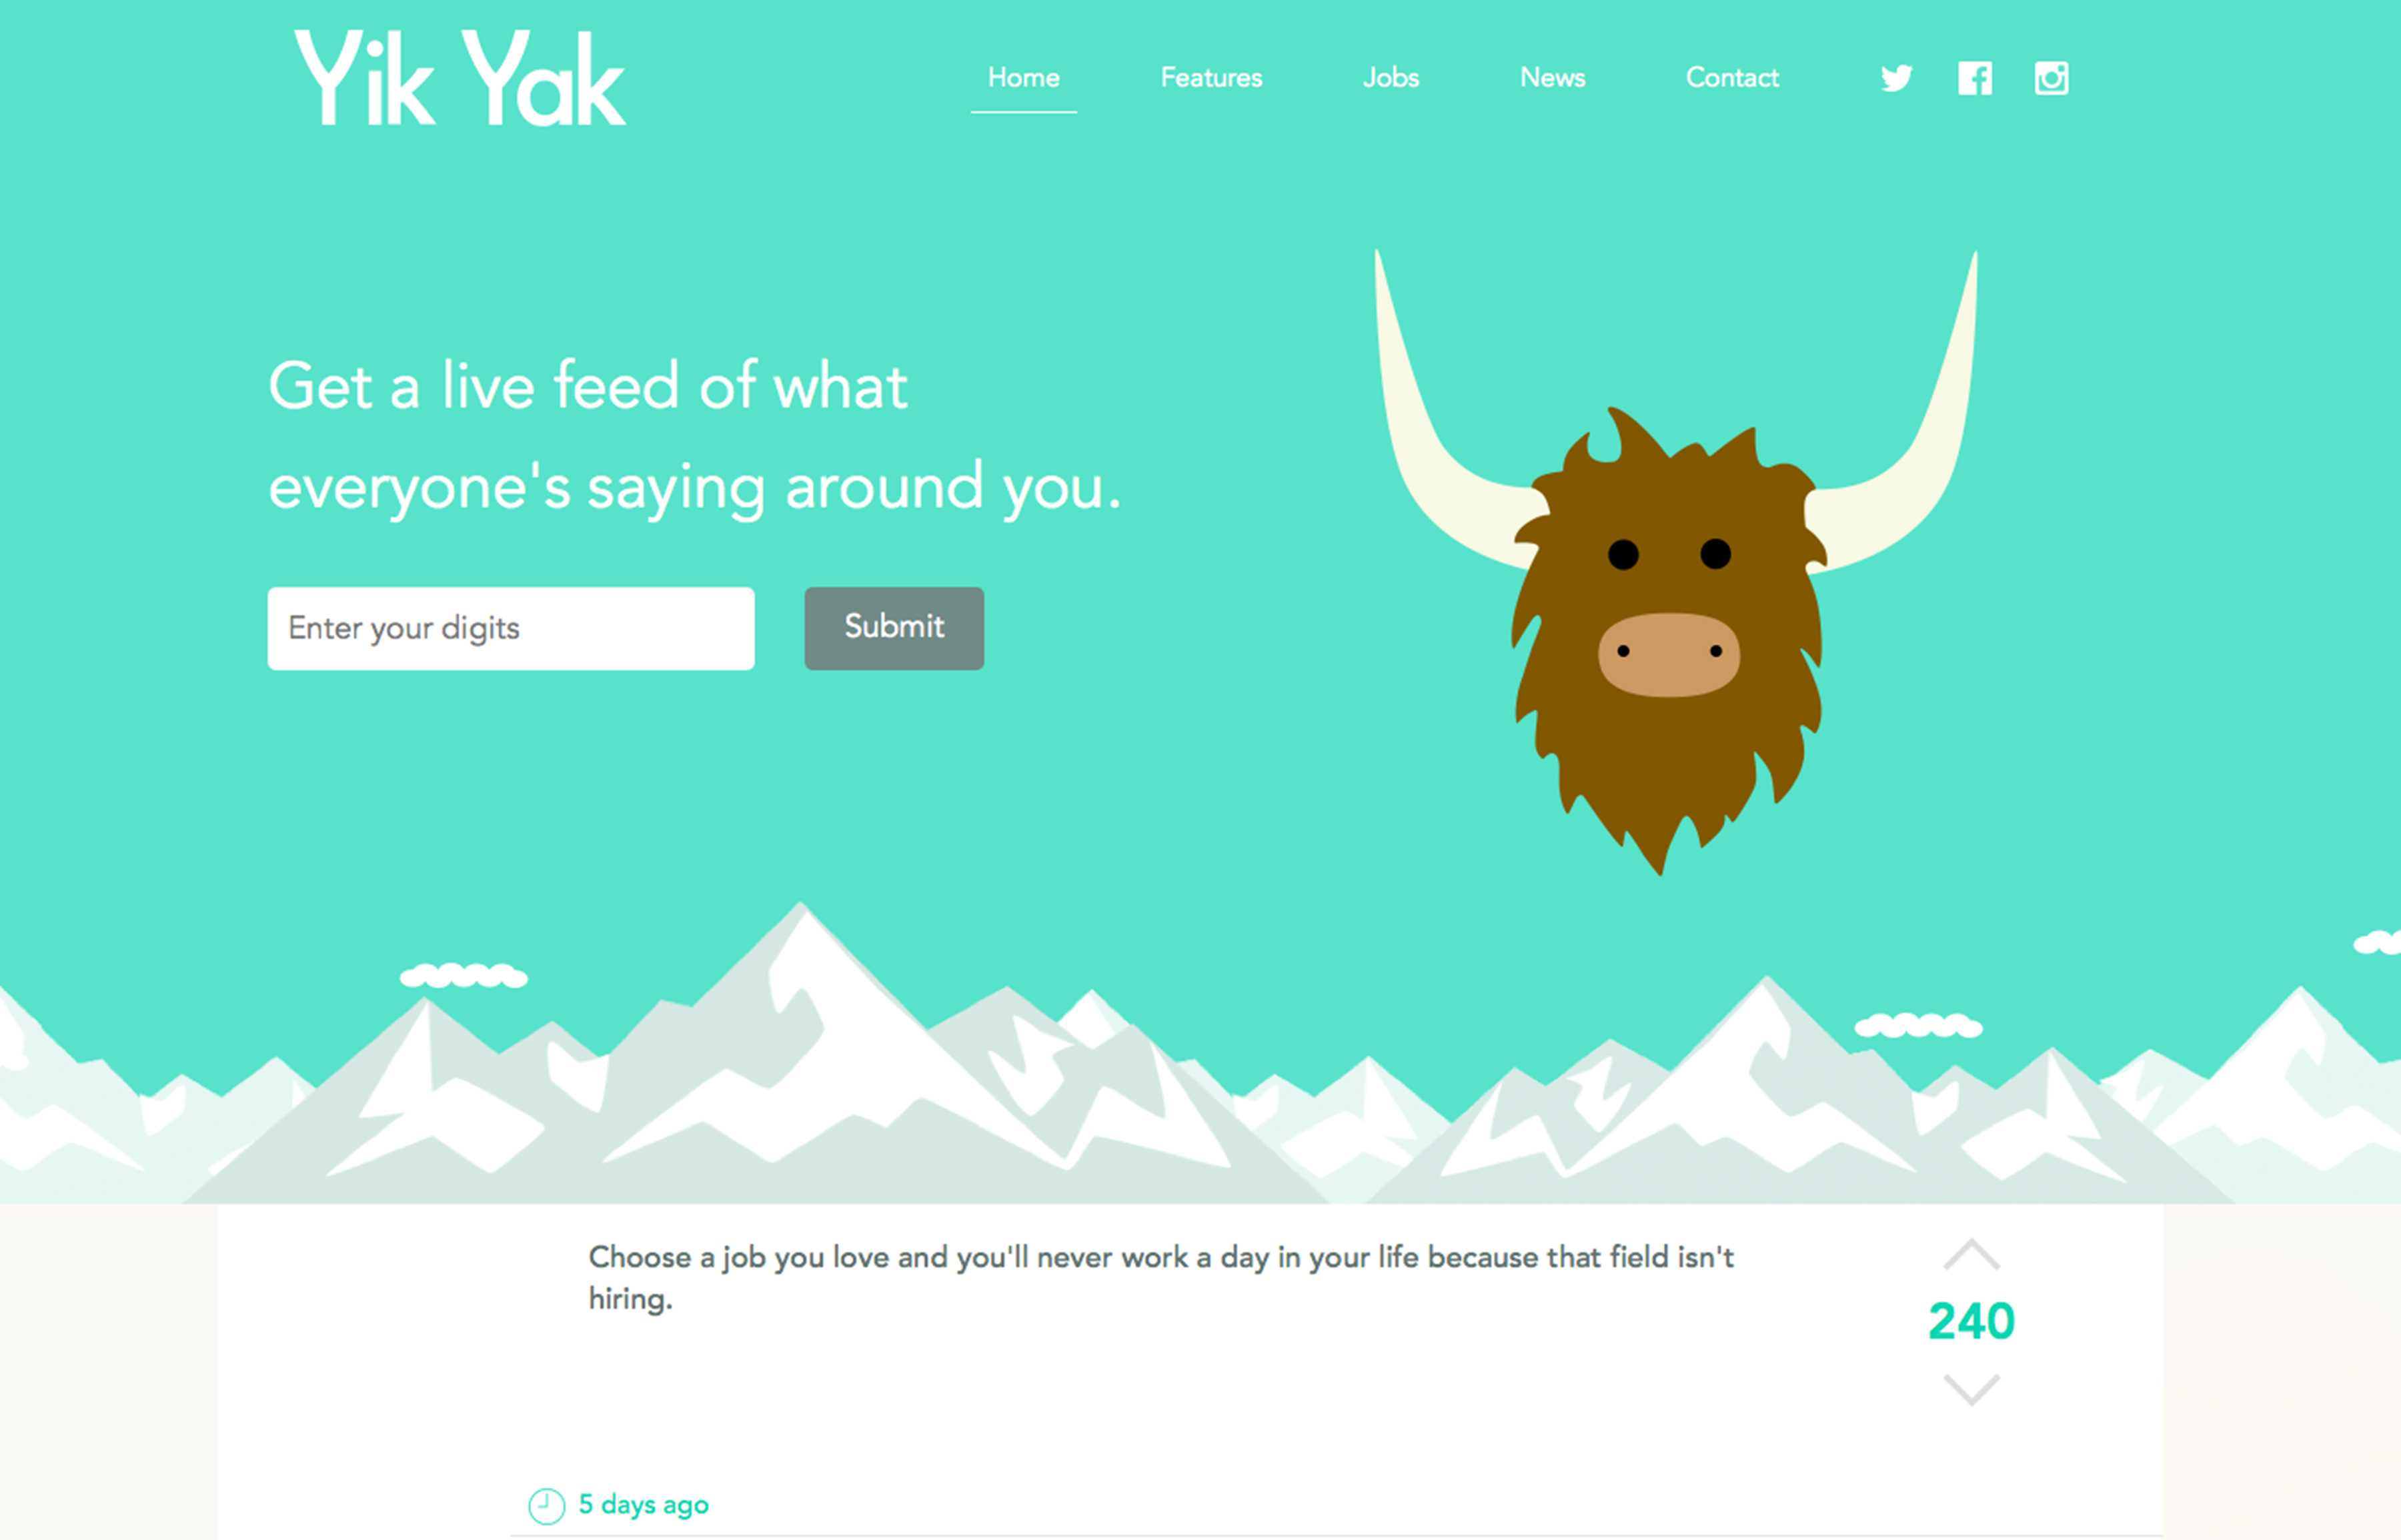 Screenshot of Yik Yak website